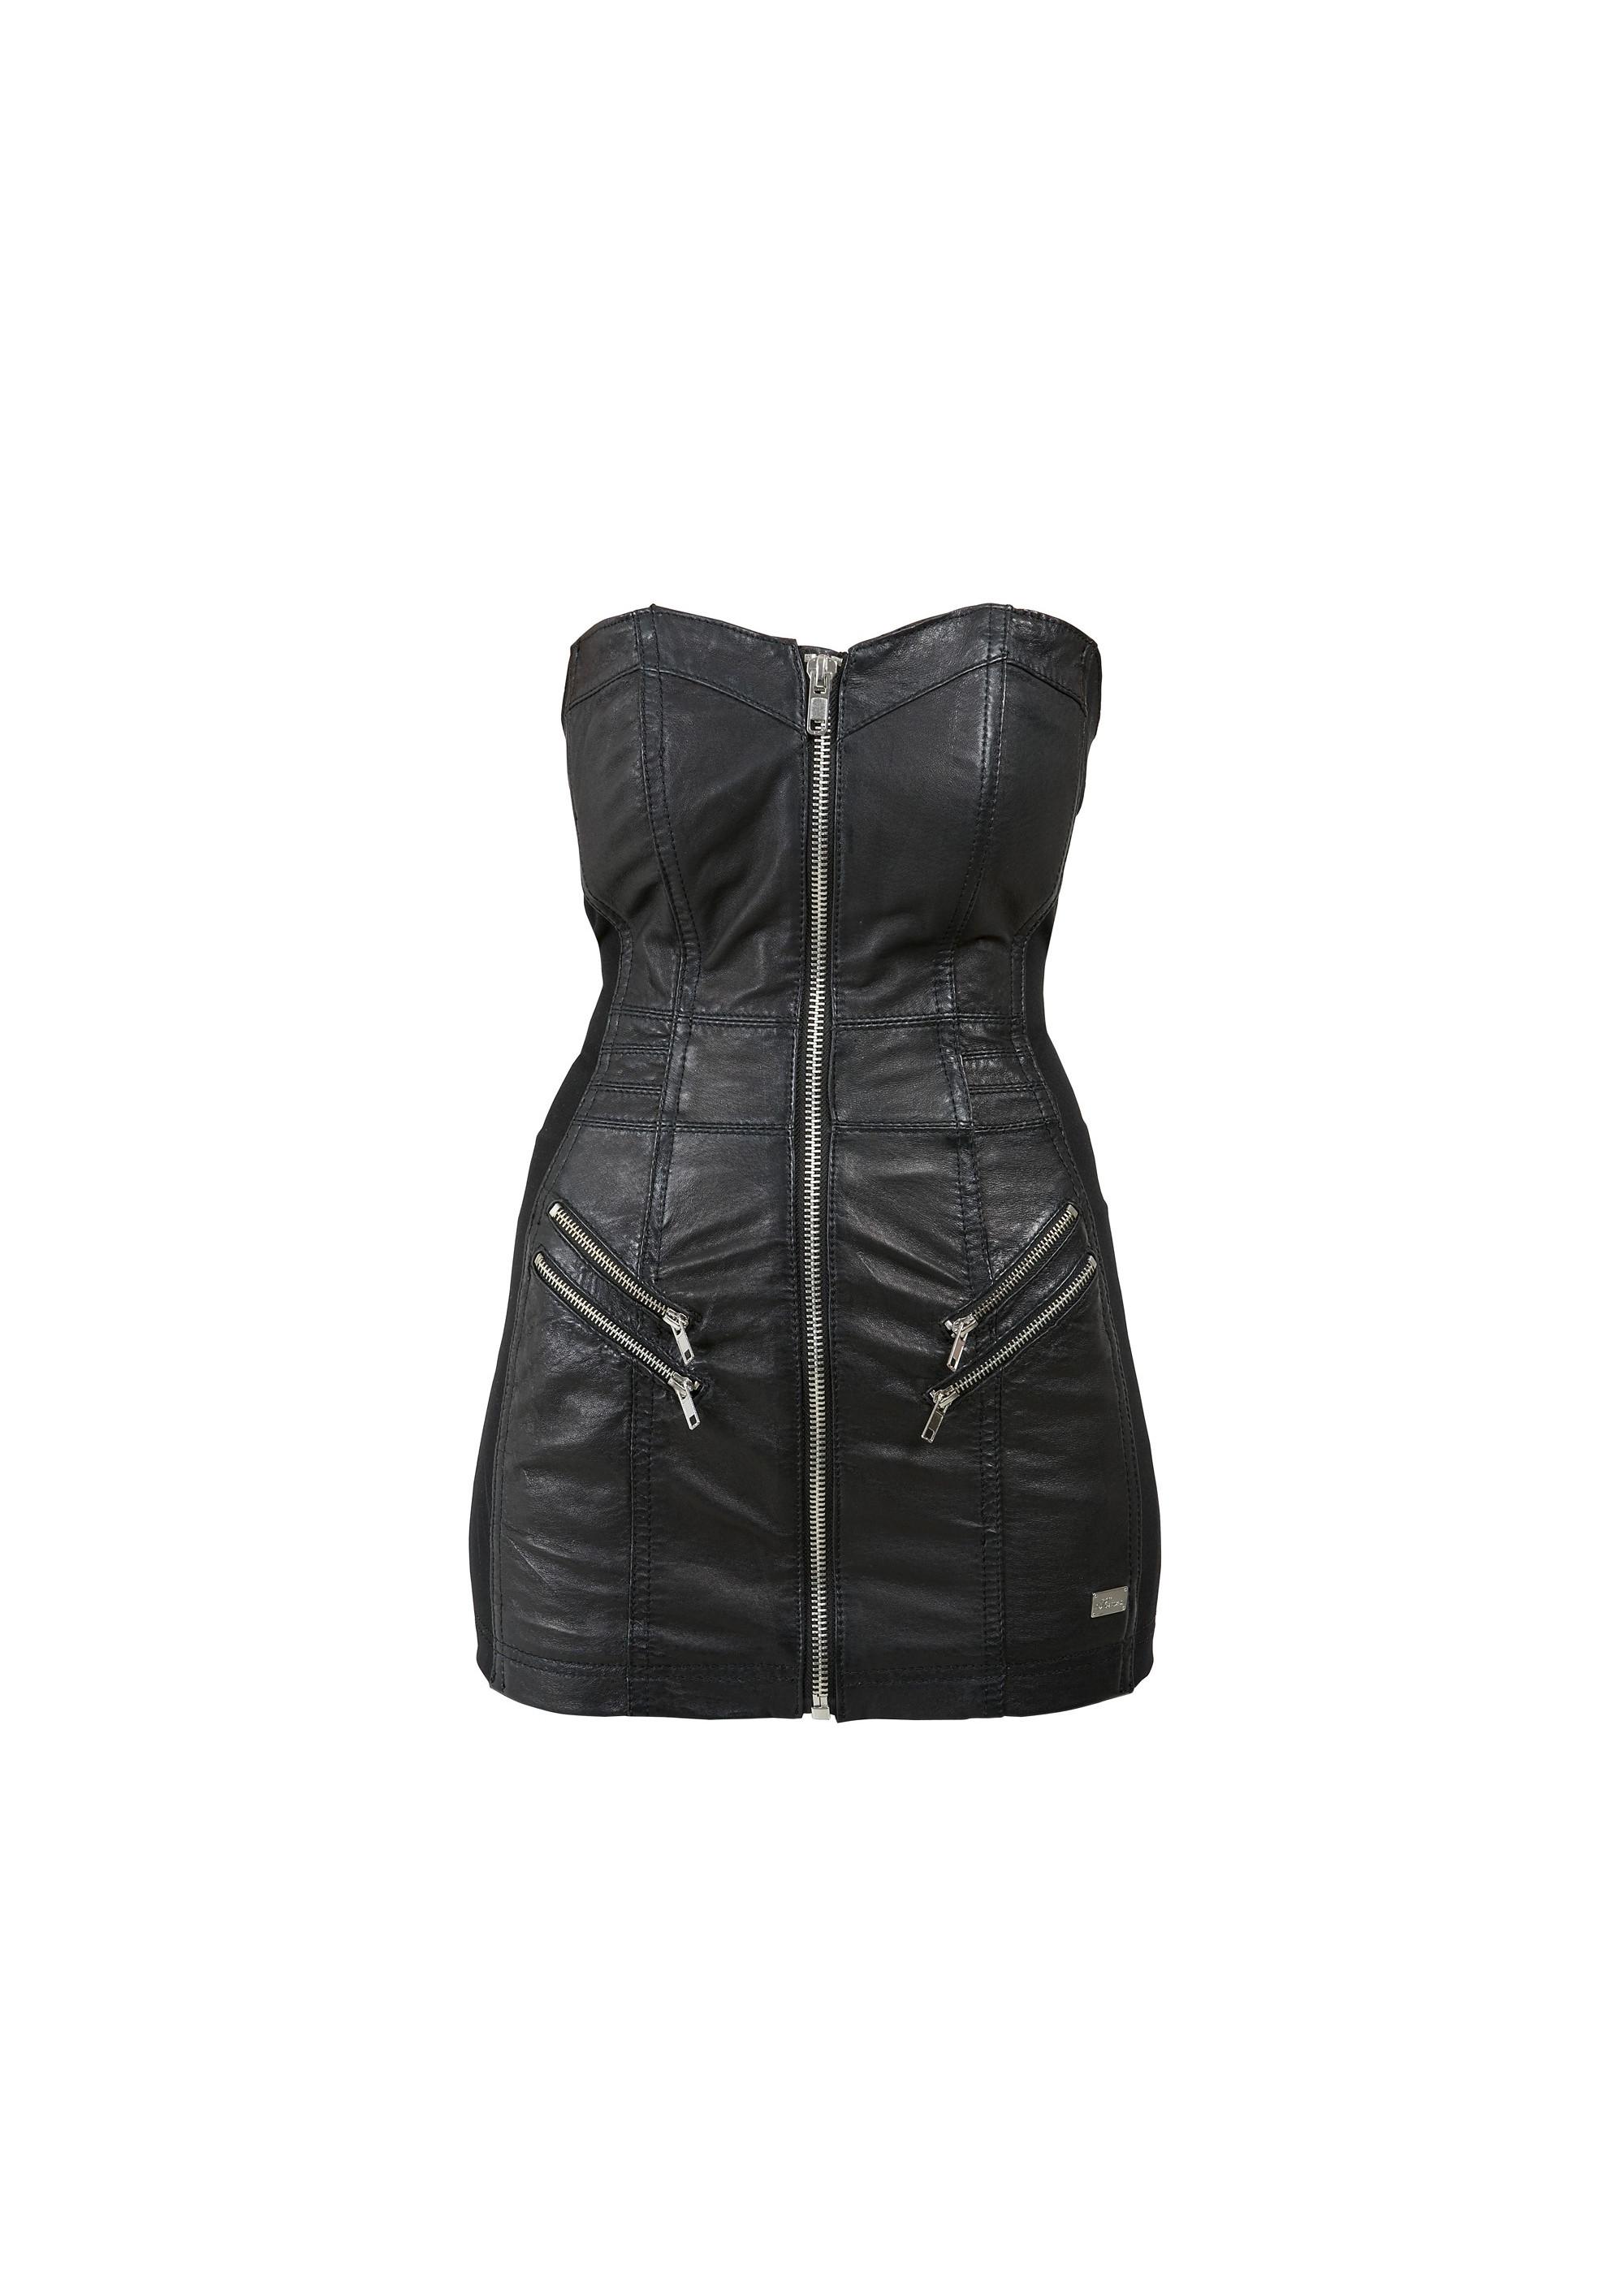 Jofama - Kenza Dress Black